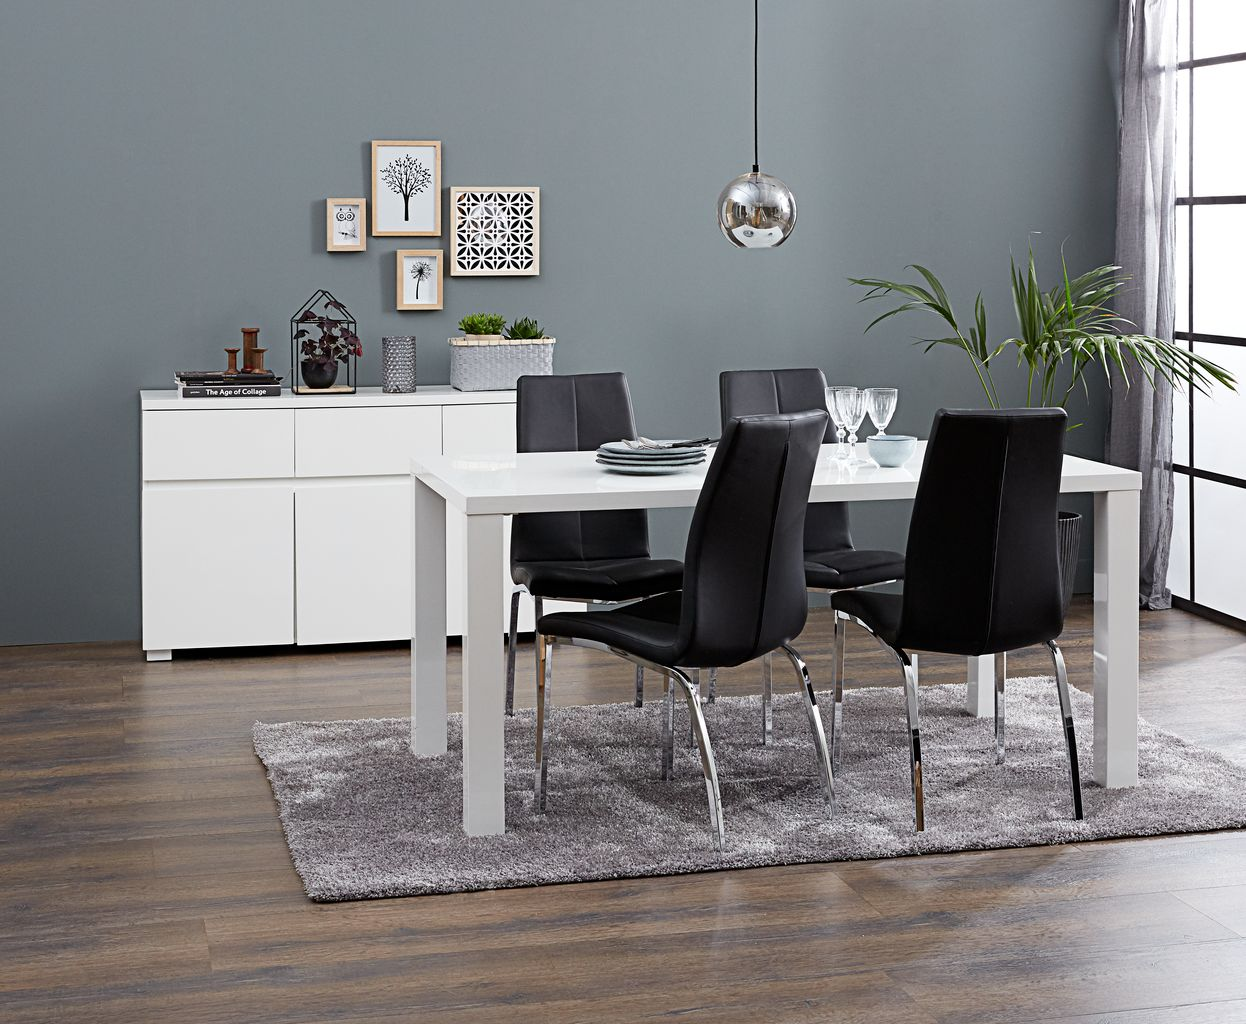 Eetkamer Wit Hoogglans : Eettafel omme 90x160 wit hoogglans jysk